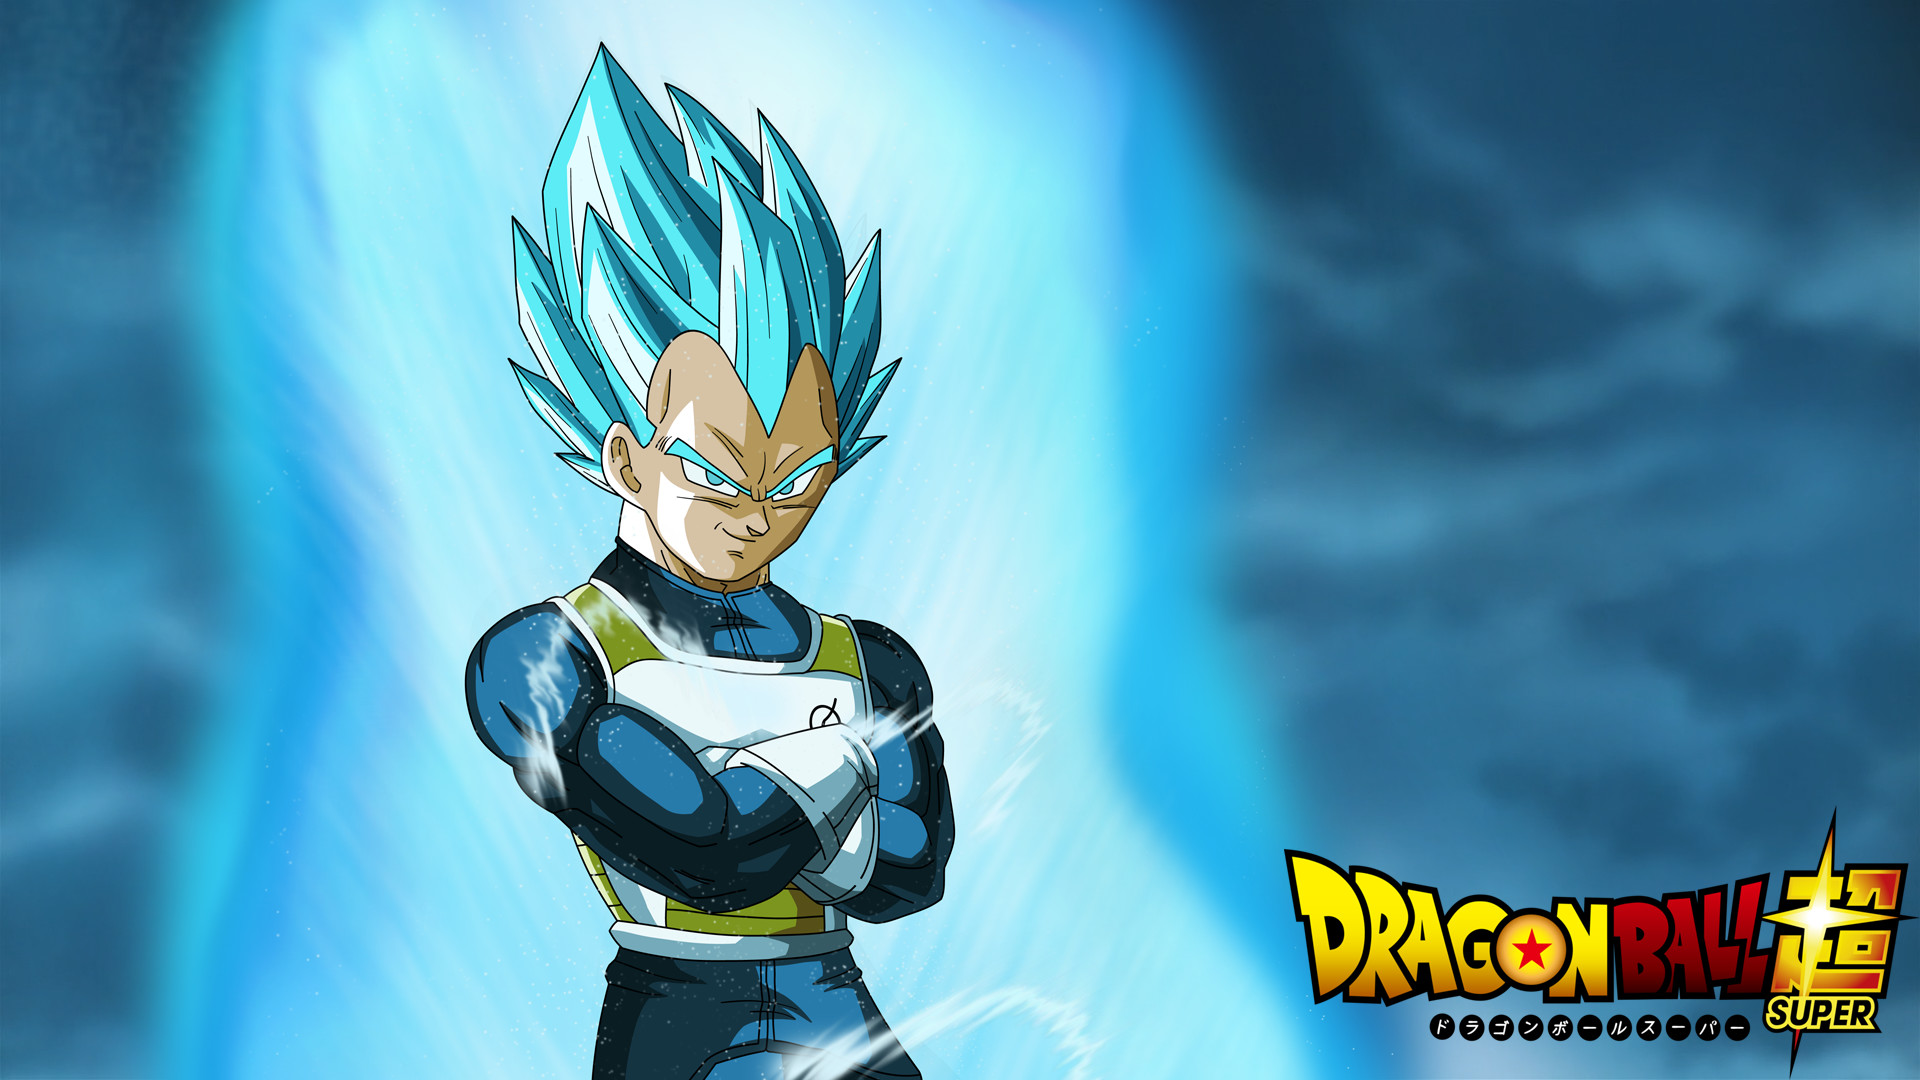 Anime Dragon Ball Super Dragon Ball Z Vegeta (Dragon Ball) Wallpaper